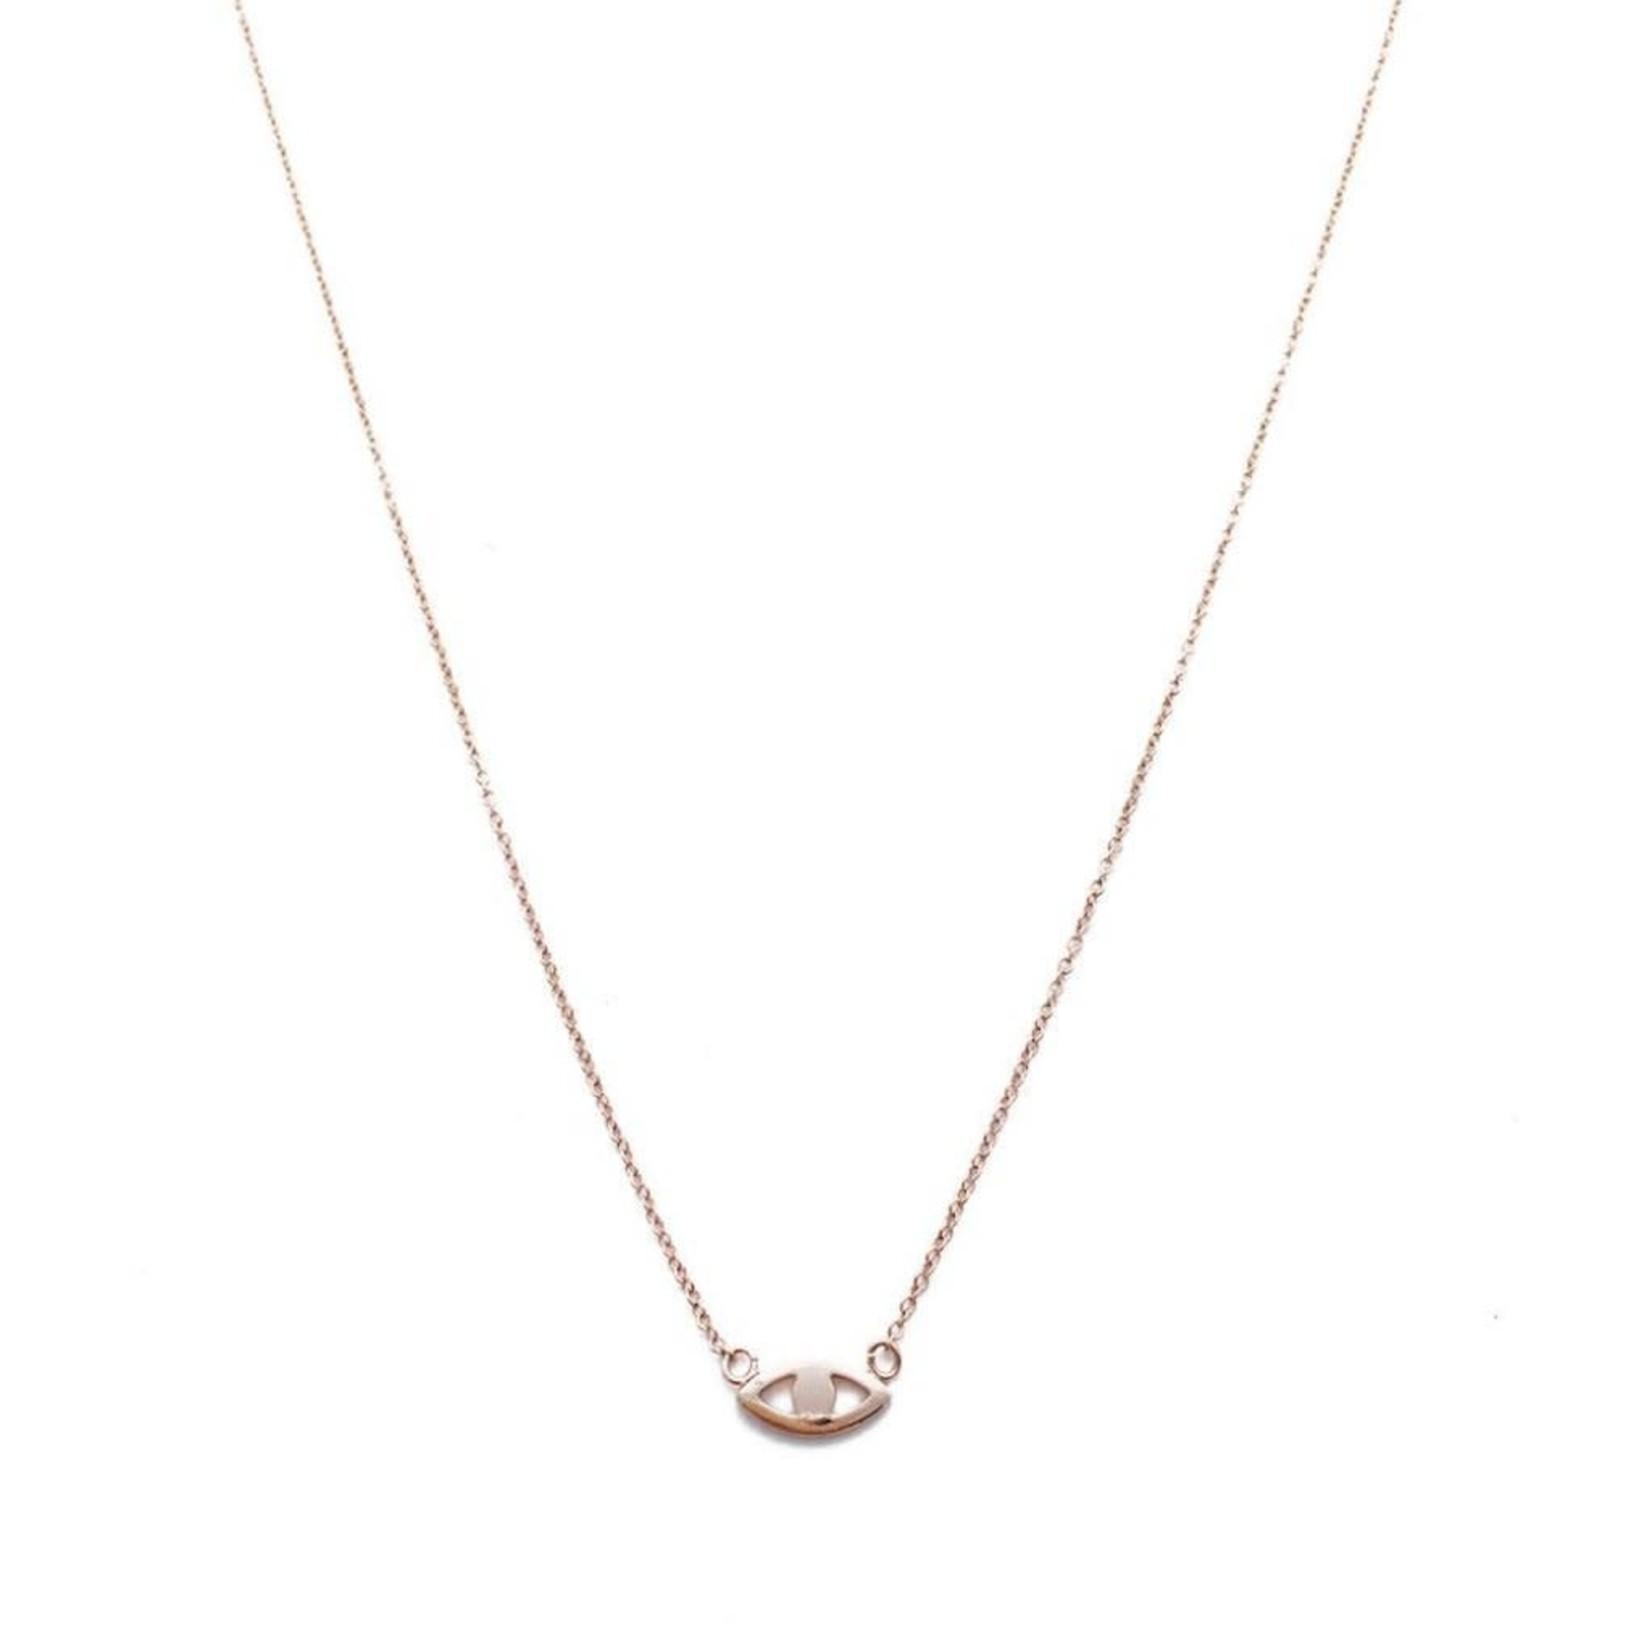 Honeycat Jewelry Honeycat Evil Eye Necklace